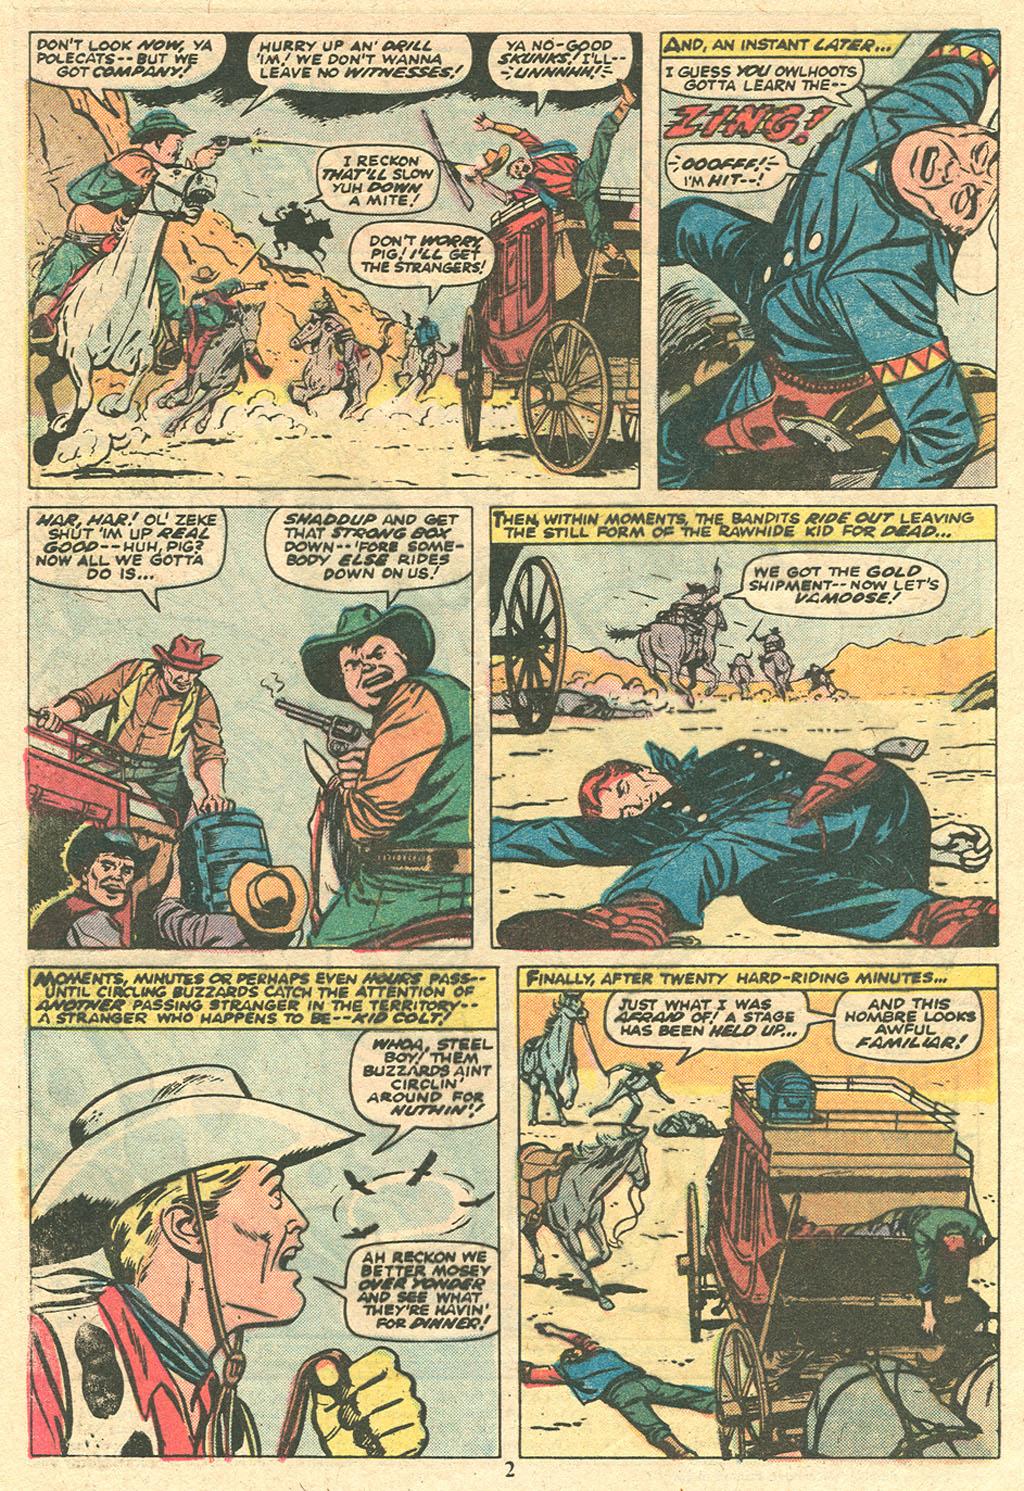 Read online Two-Gun Kid comic -  Issue #117 - 4